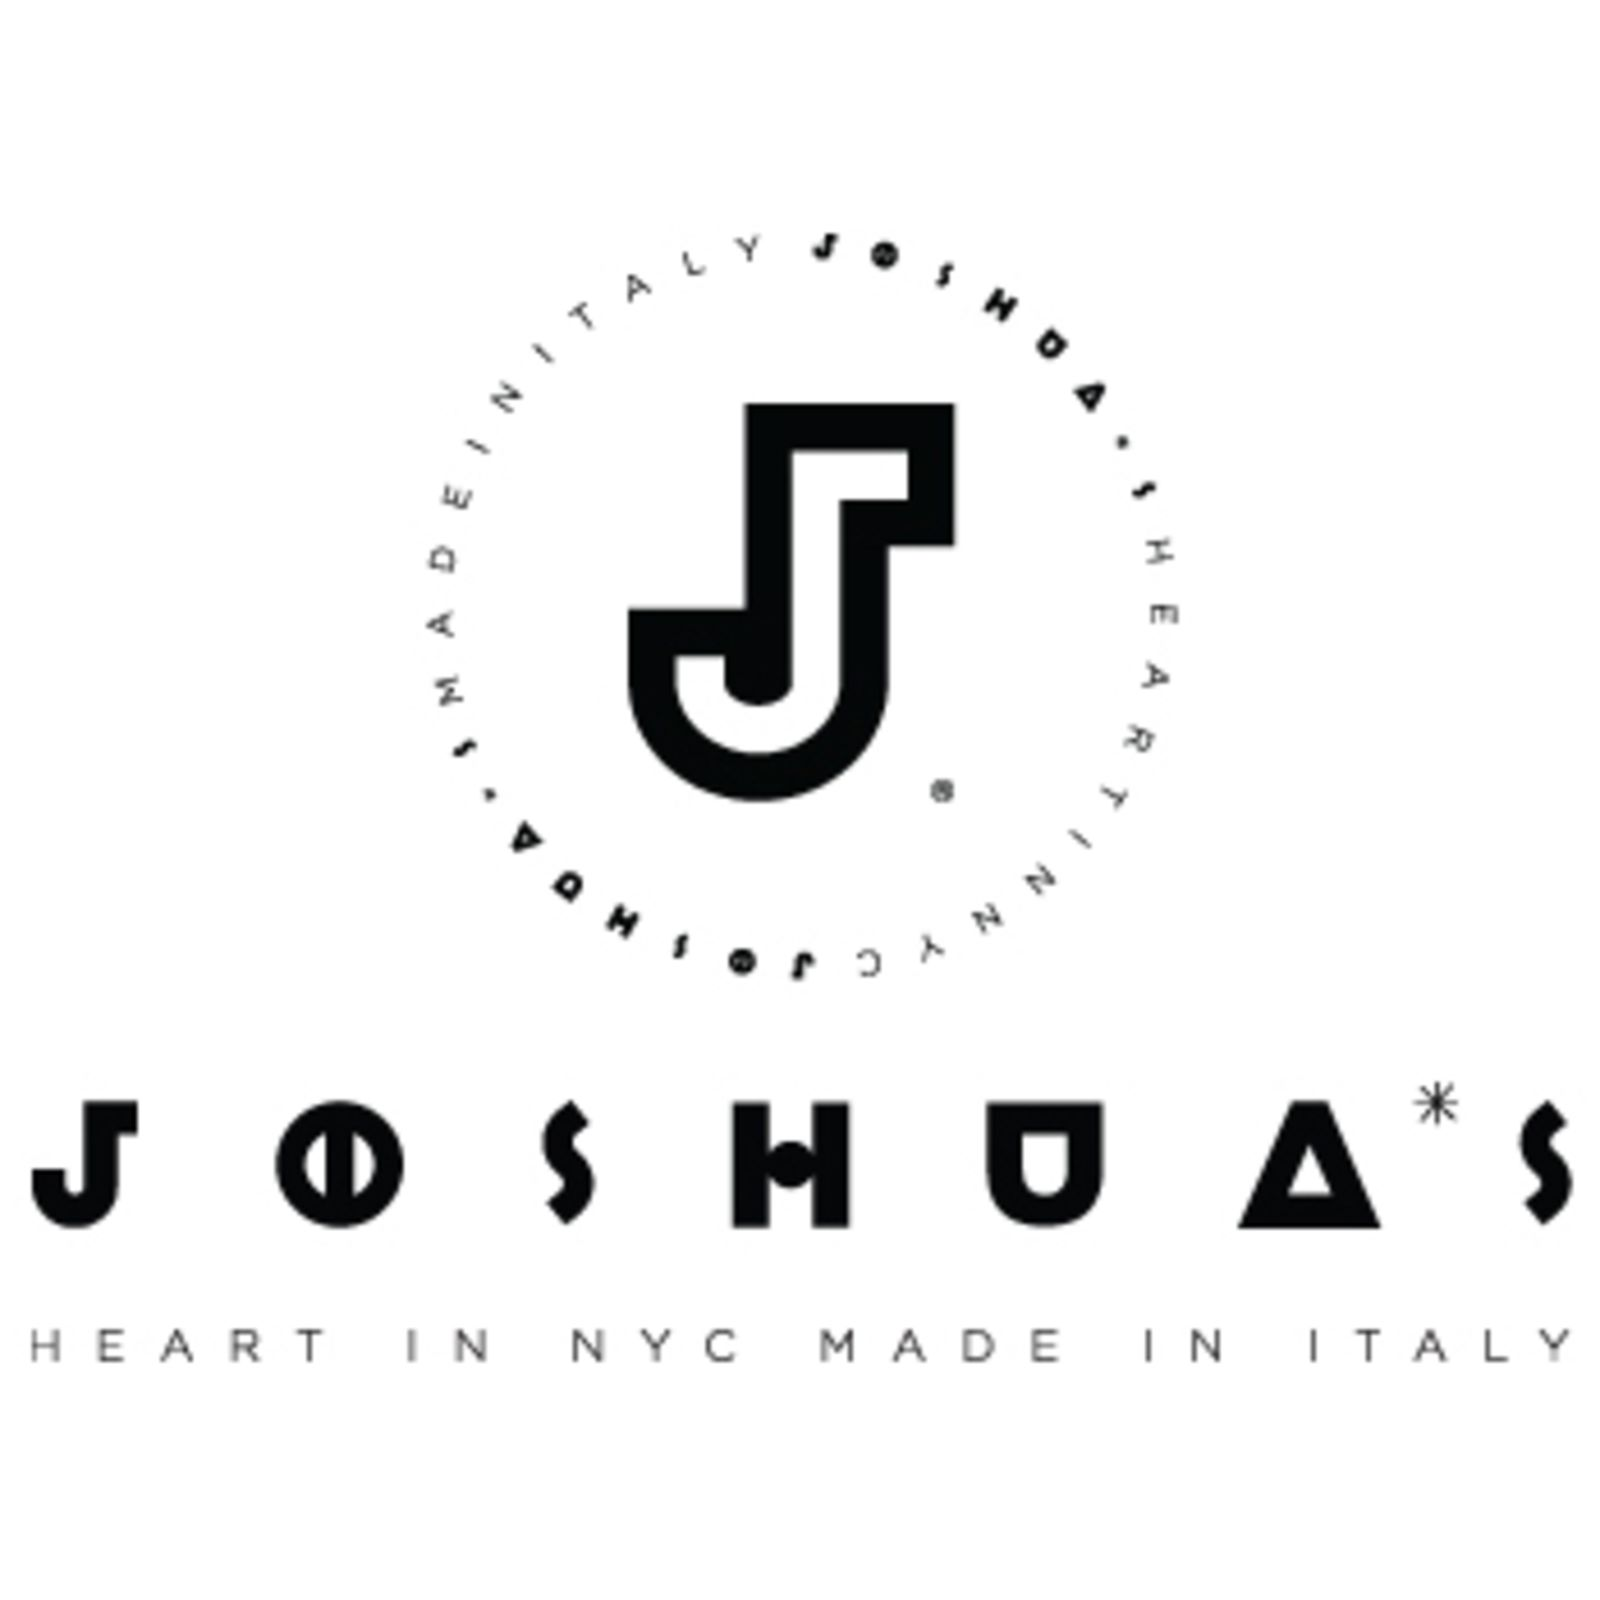 JOSHUA'S